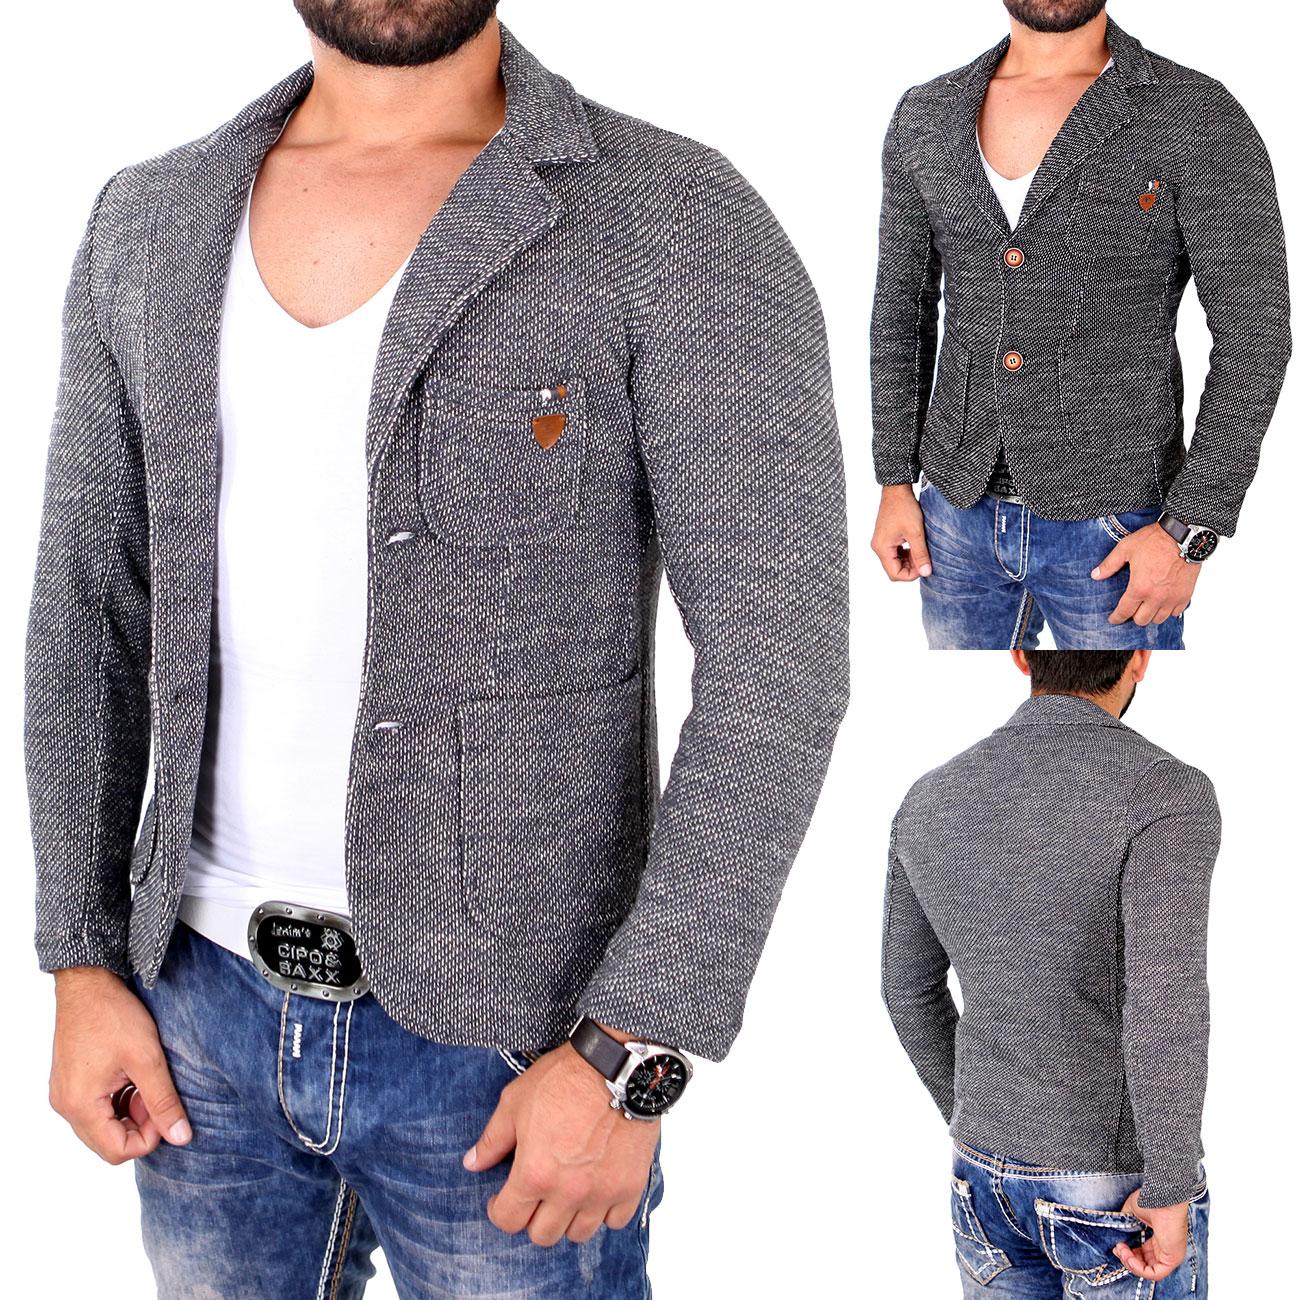 reslad casual herren sakko fancy look jacket strick blazer jacke rs 1421 ebay. Black Bedroom Furniture Sets. Home Design Ideas